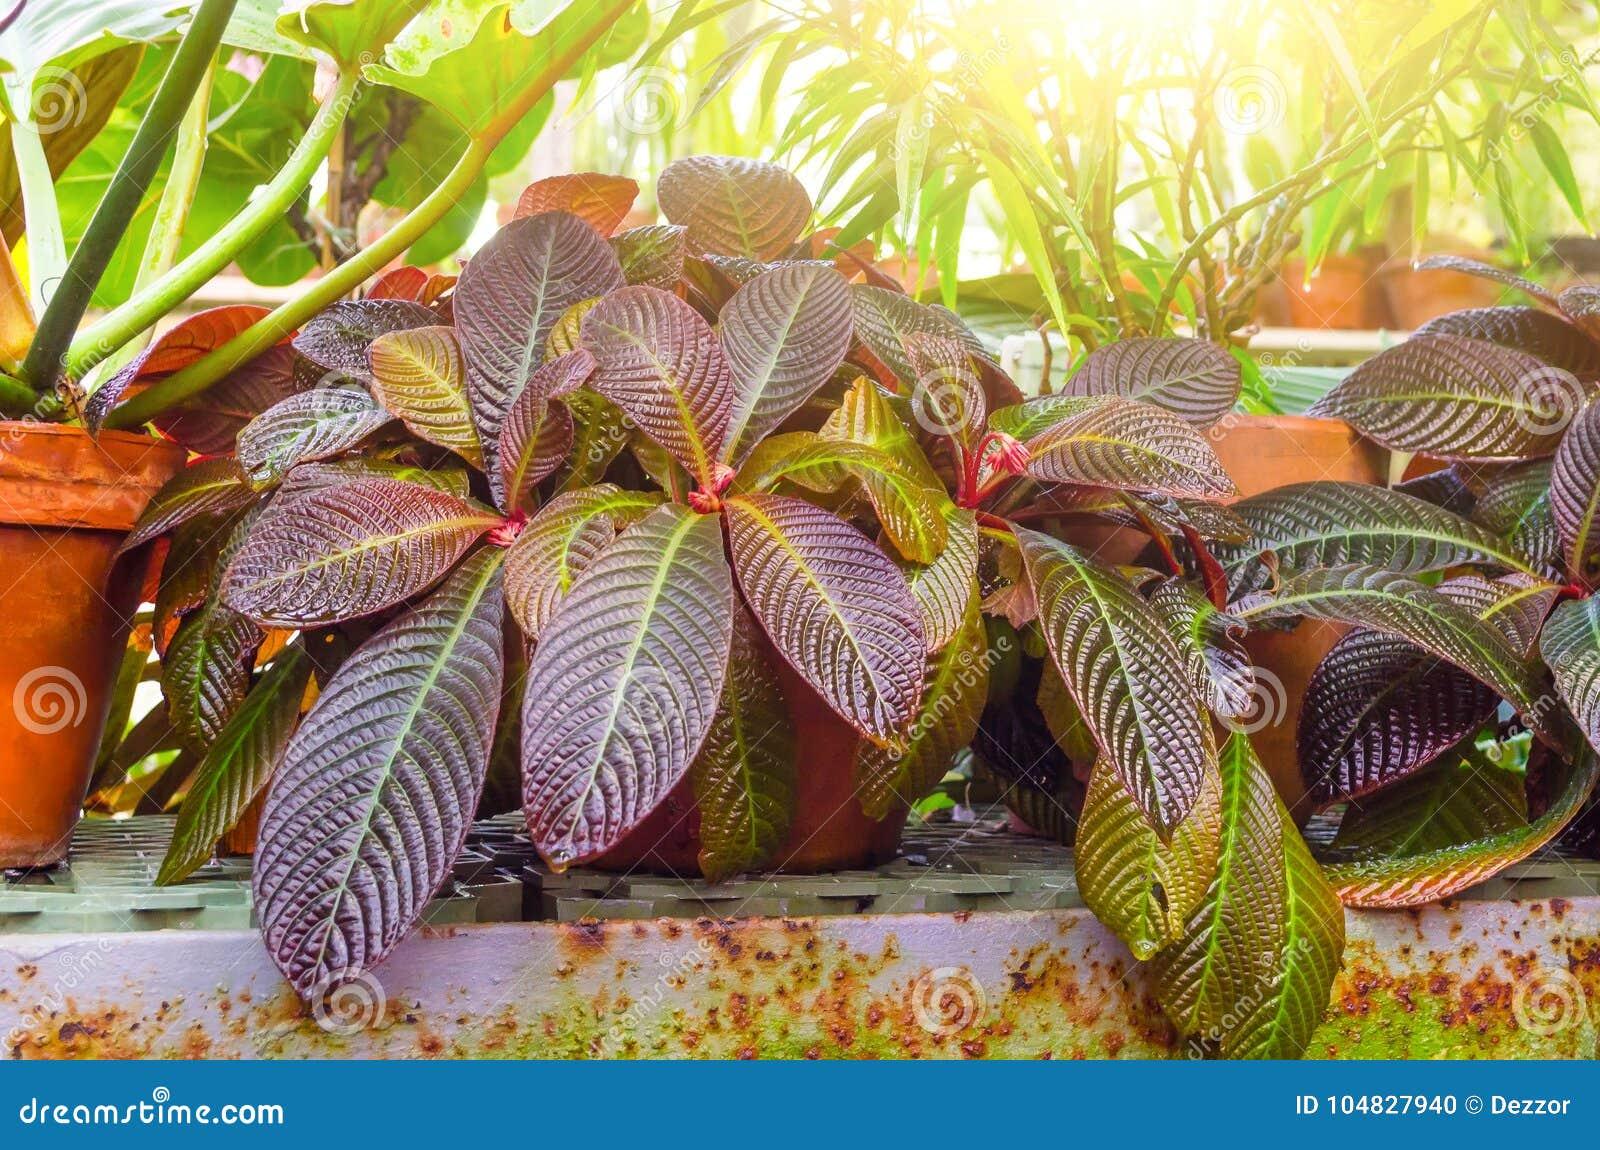 Croton Codiaeum Variegatum Plants With Colorful Leaves In Tropical ...